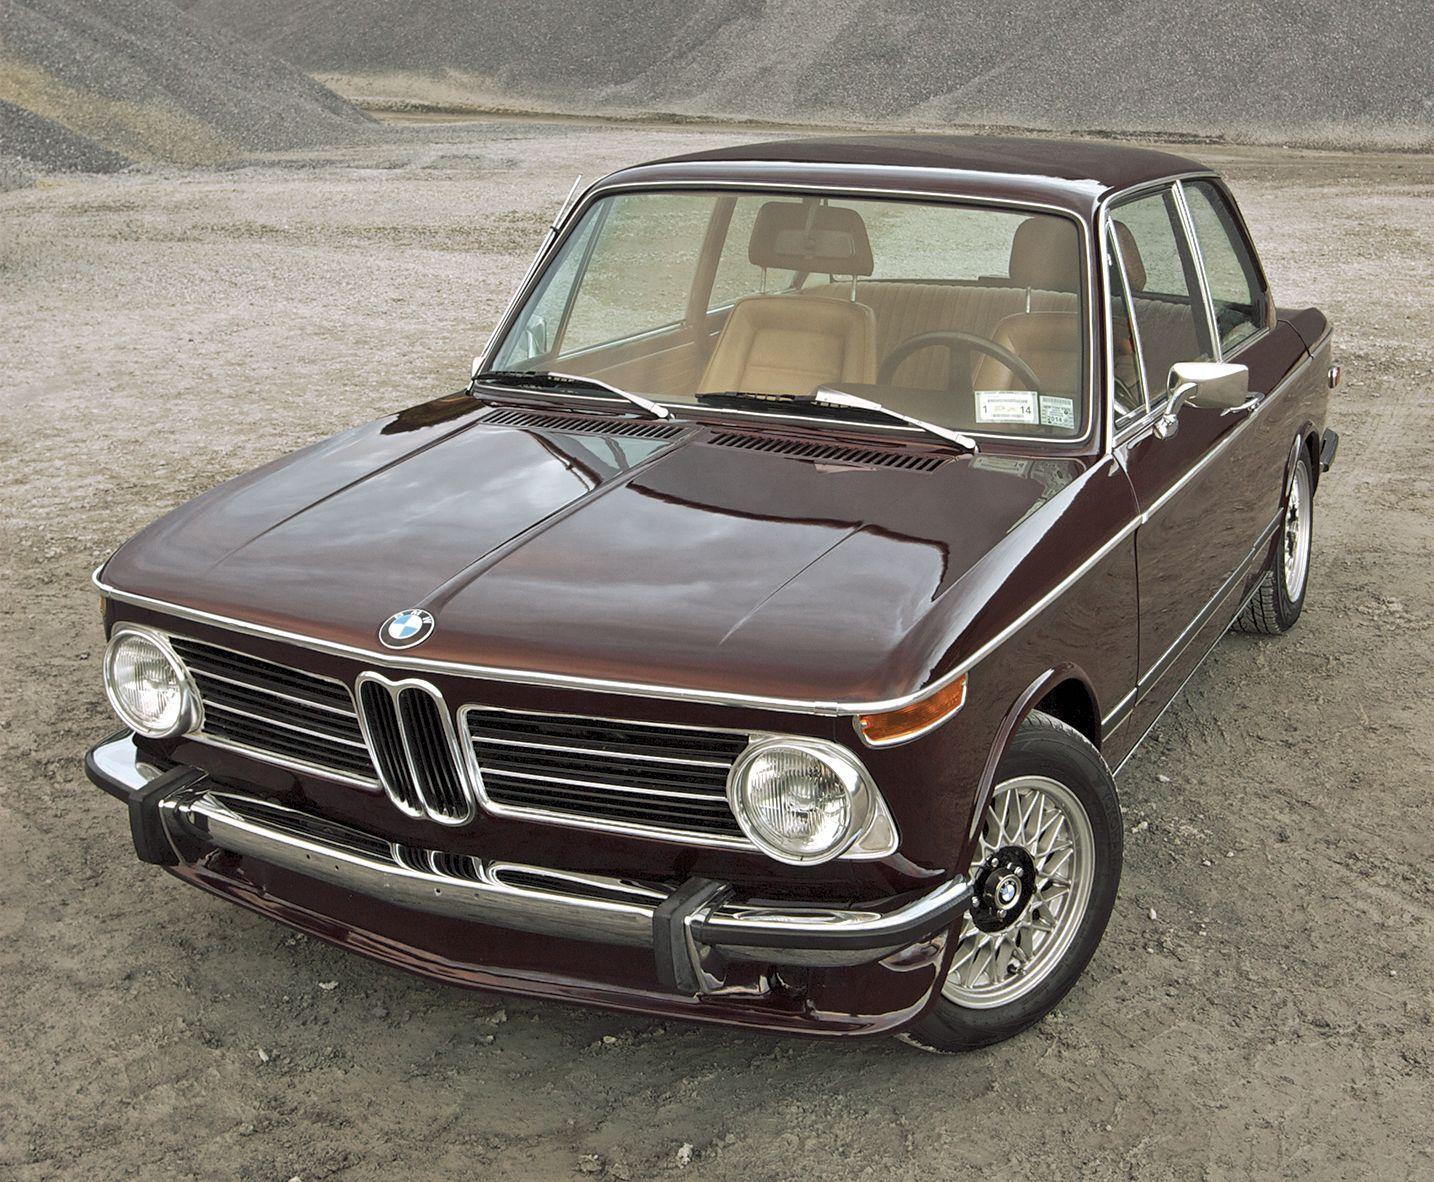 1972 BMW 2002 | Gumby | Pinterest | Bmw 2002, BMW and Cars